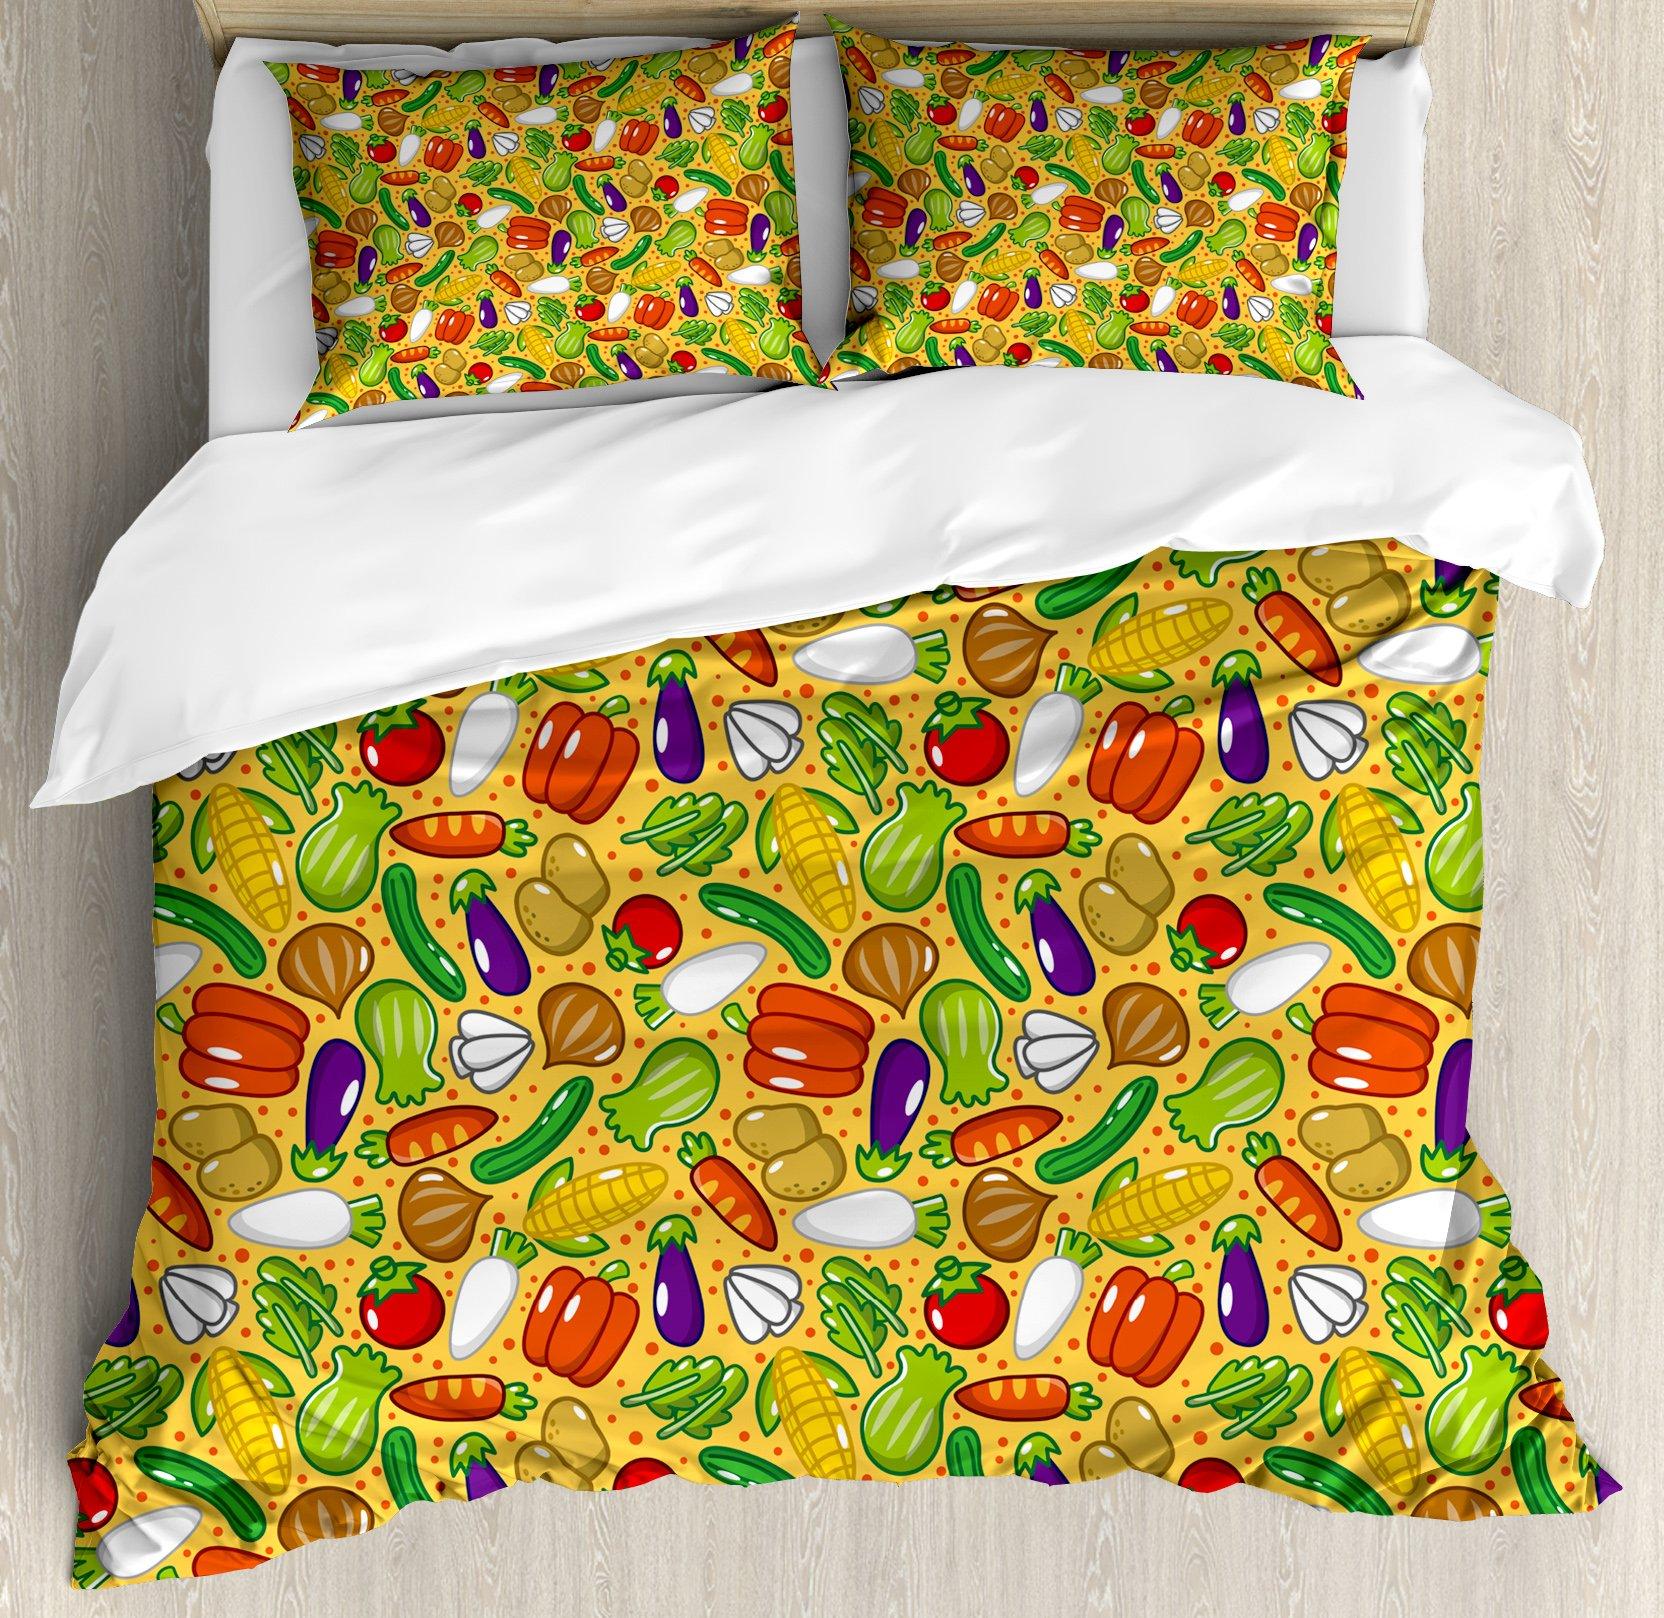 Vegetables King Size Duvet Cover Set by Lunarable, Eggplant Squash Corn Carrot Tomatoes Kale Botany Plants Supper Health Cartoon, Decorative 3 Piece Bedding Set with 2 Pillow Shams, Multicolor